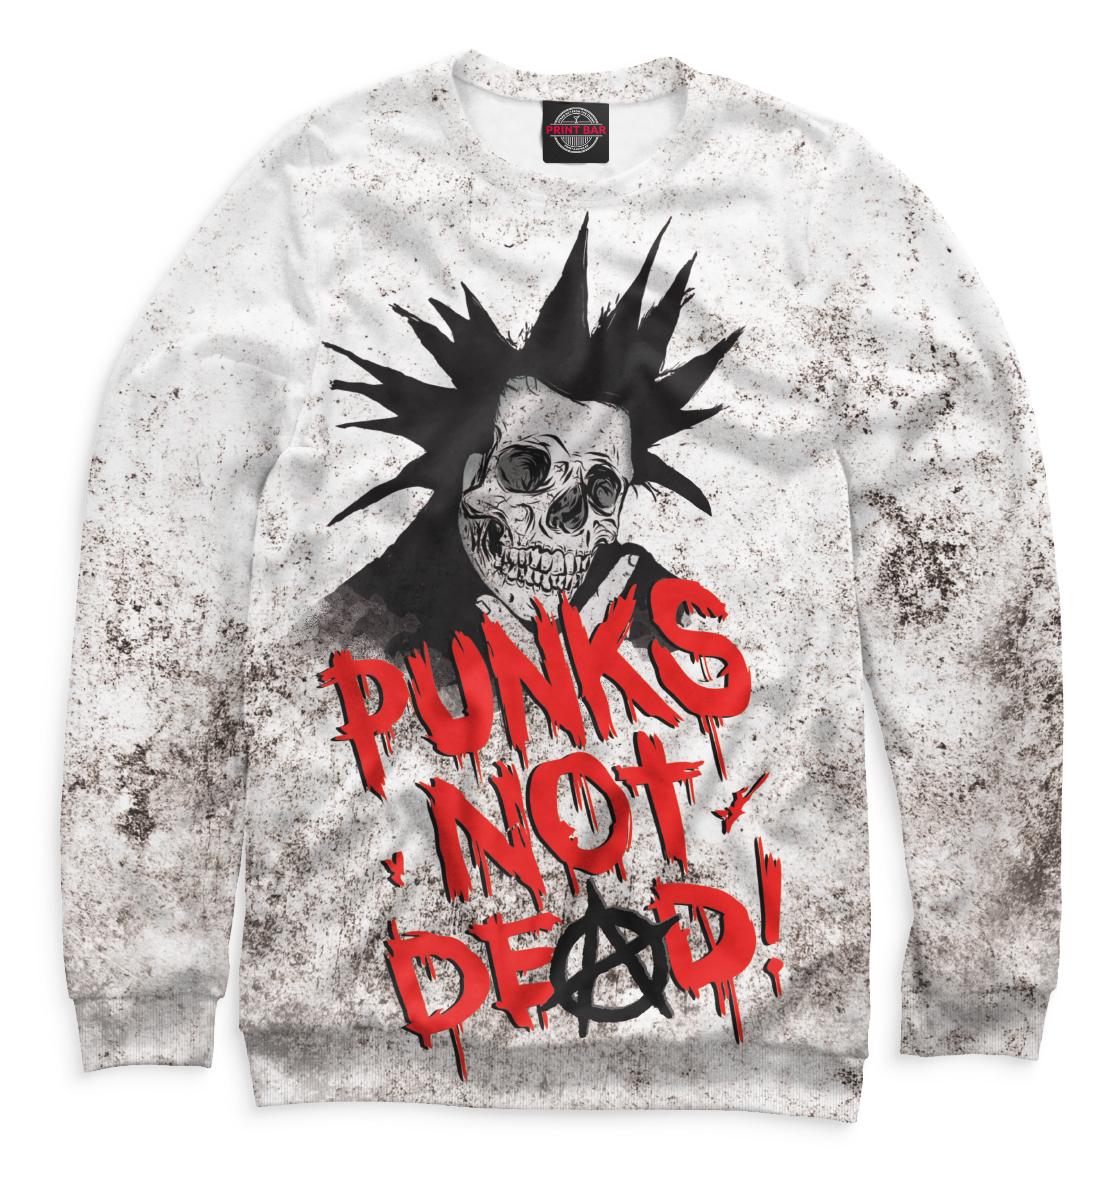 Купить Punks not Dead!, Printbar, Свитшоты, MZK-529454-swi-1